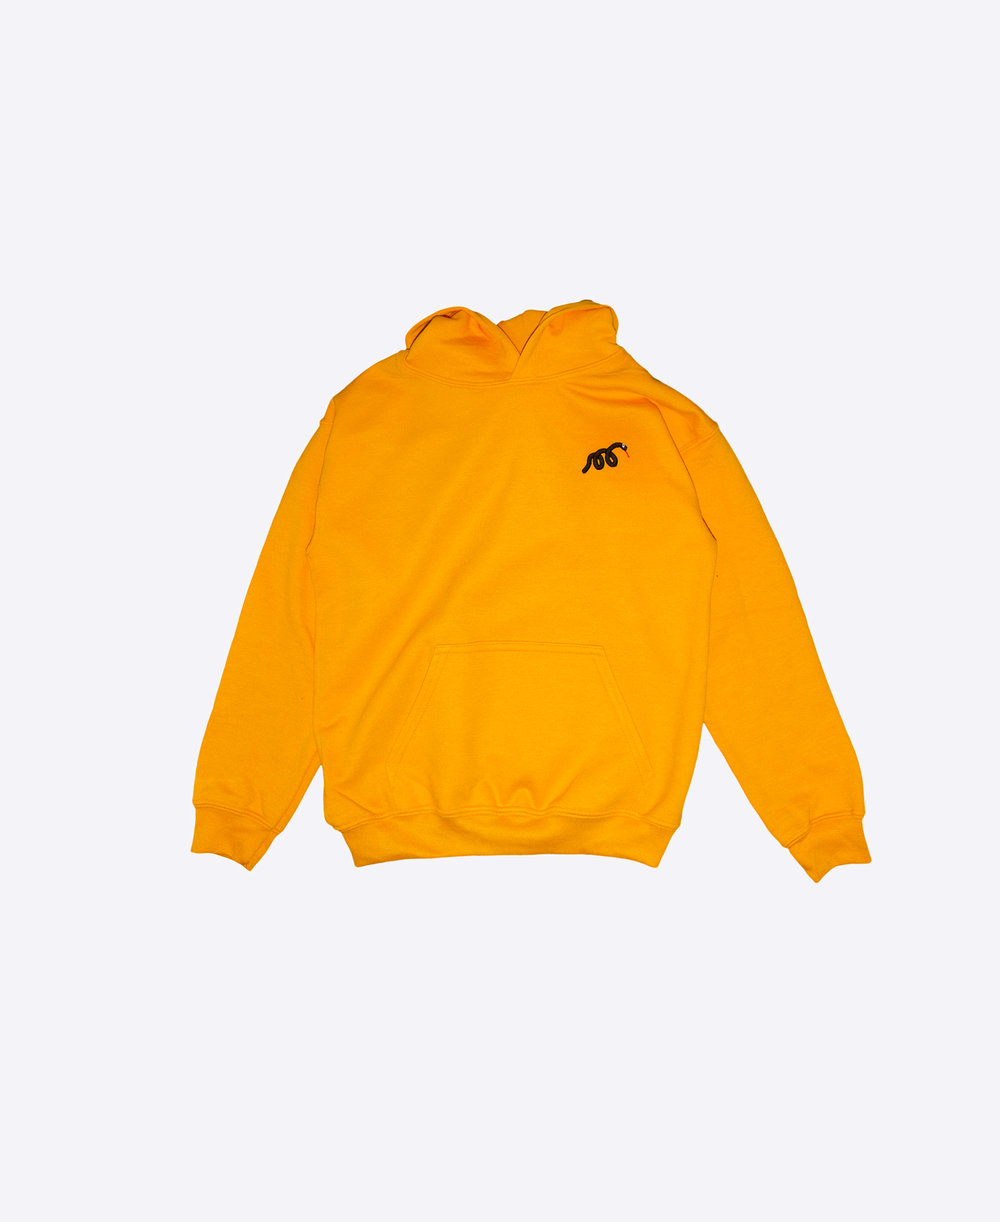 mini-snake-kids-yellow-hoodie.jpg